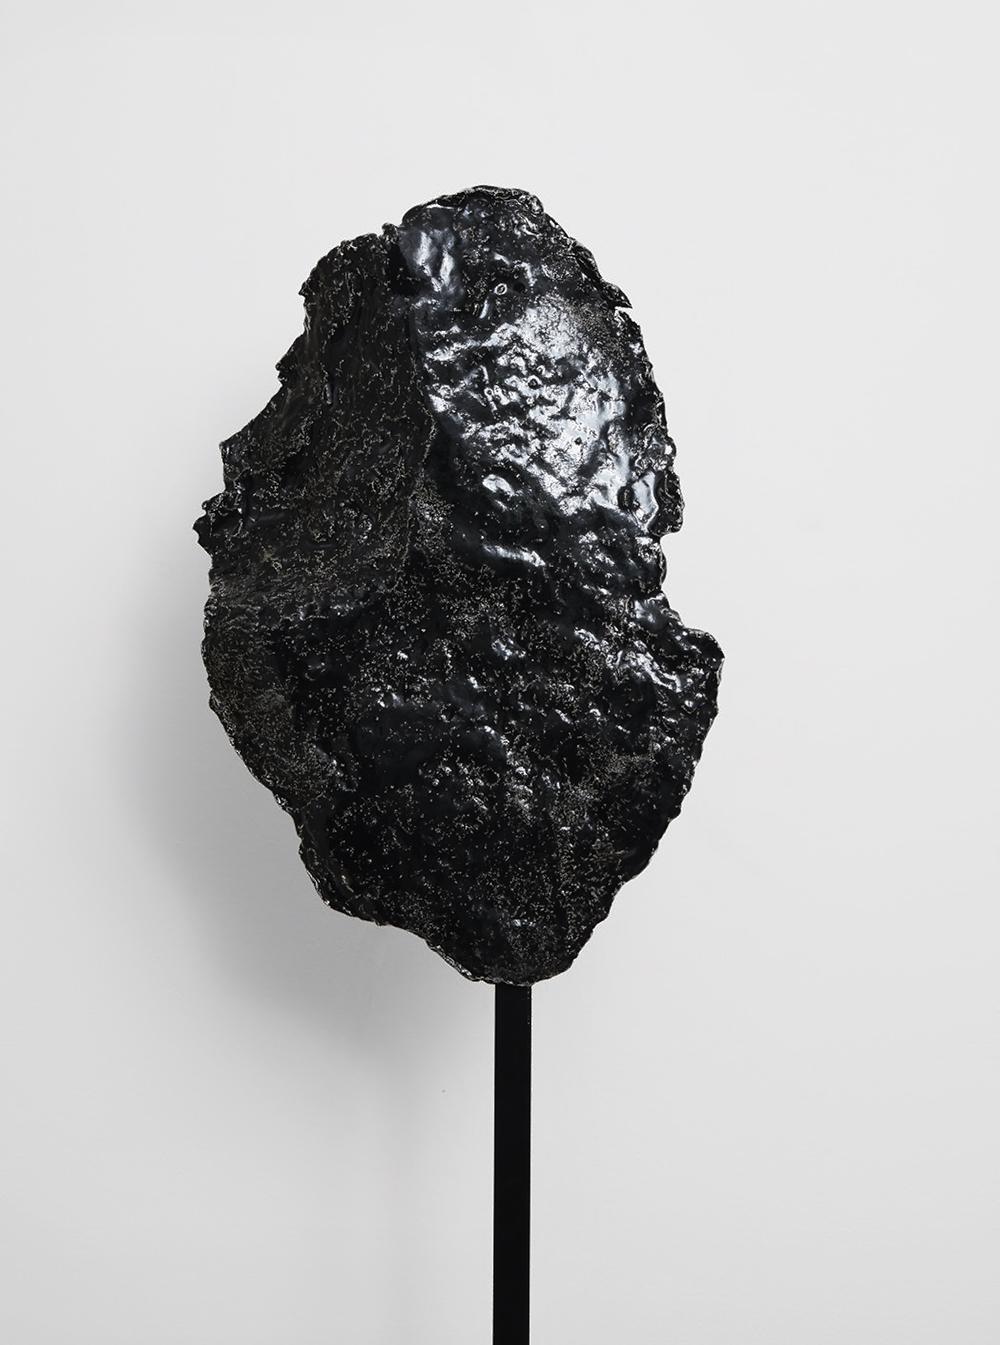 Morten K Jacobsen. Black Mountain (vertical). 2019.